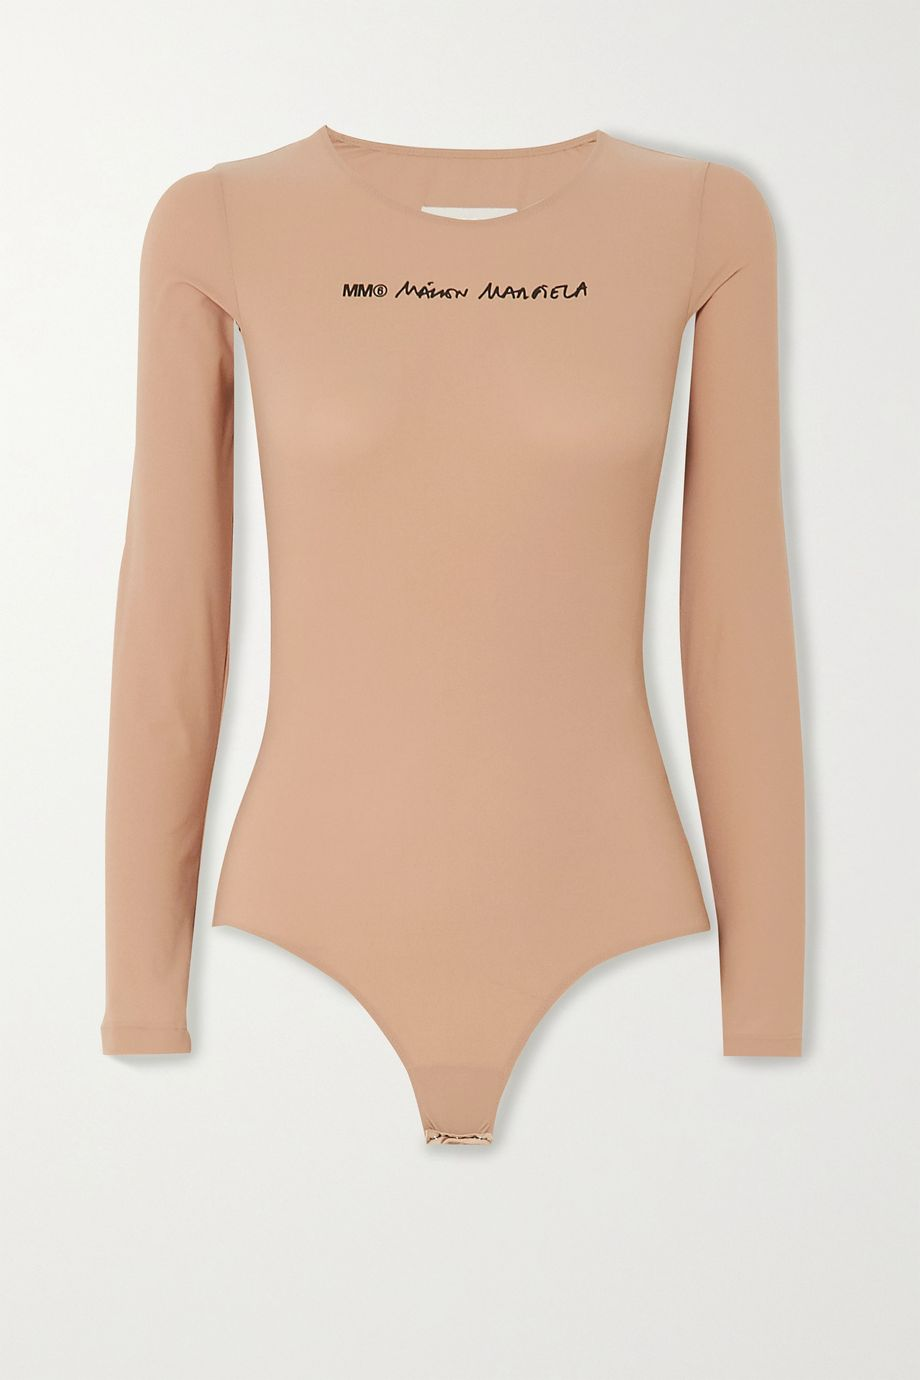 MM6 Maison Margiela Body aus bedrucktem Stretch-Jersey